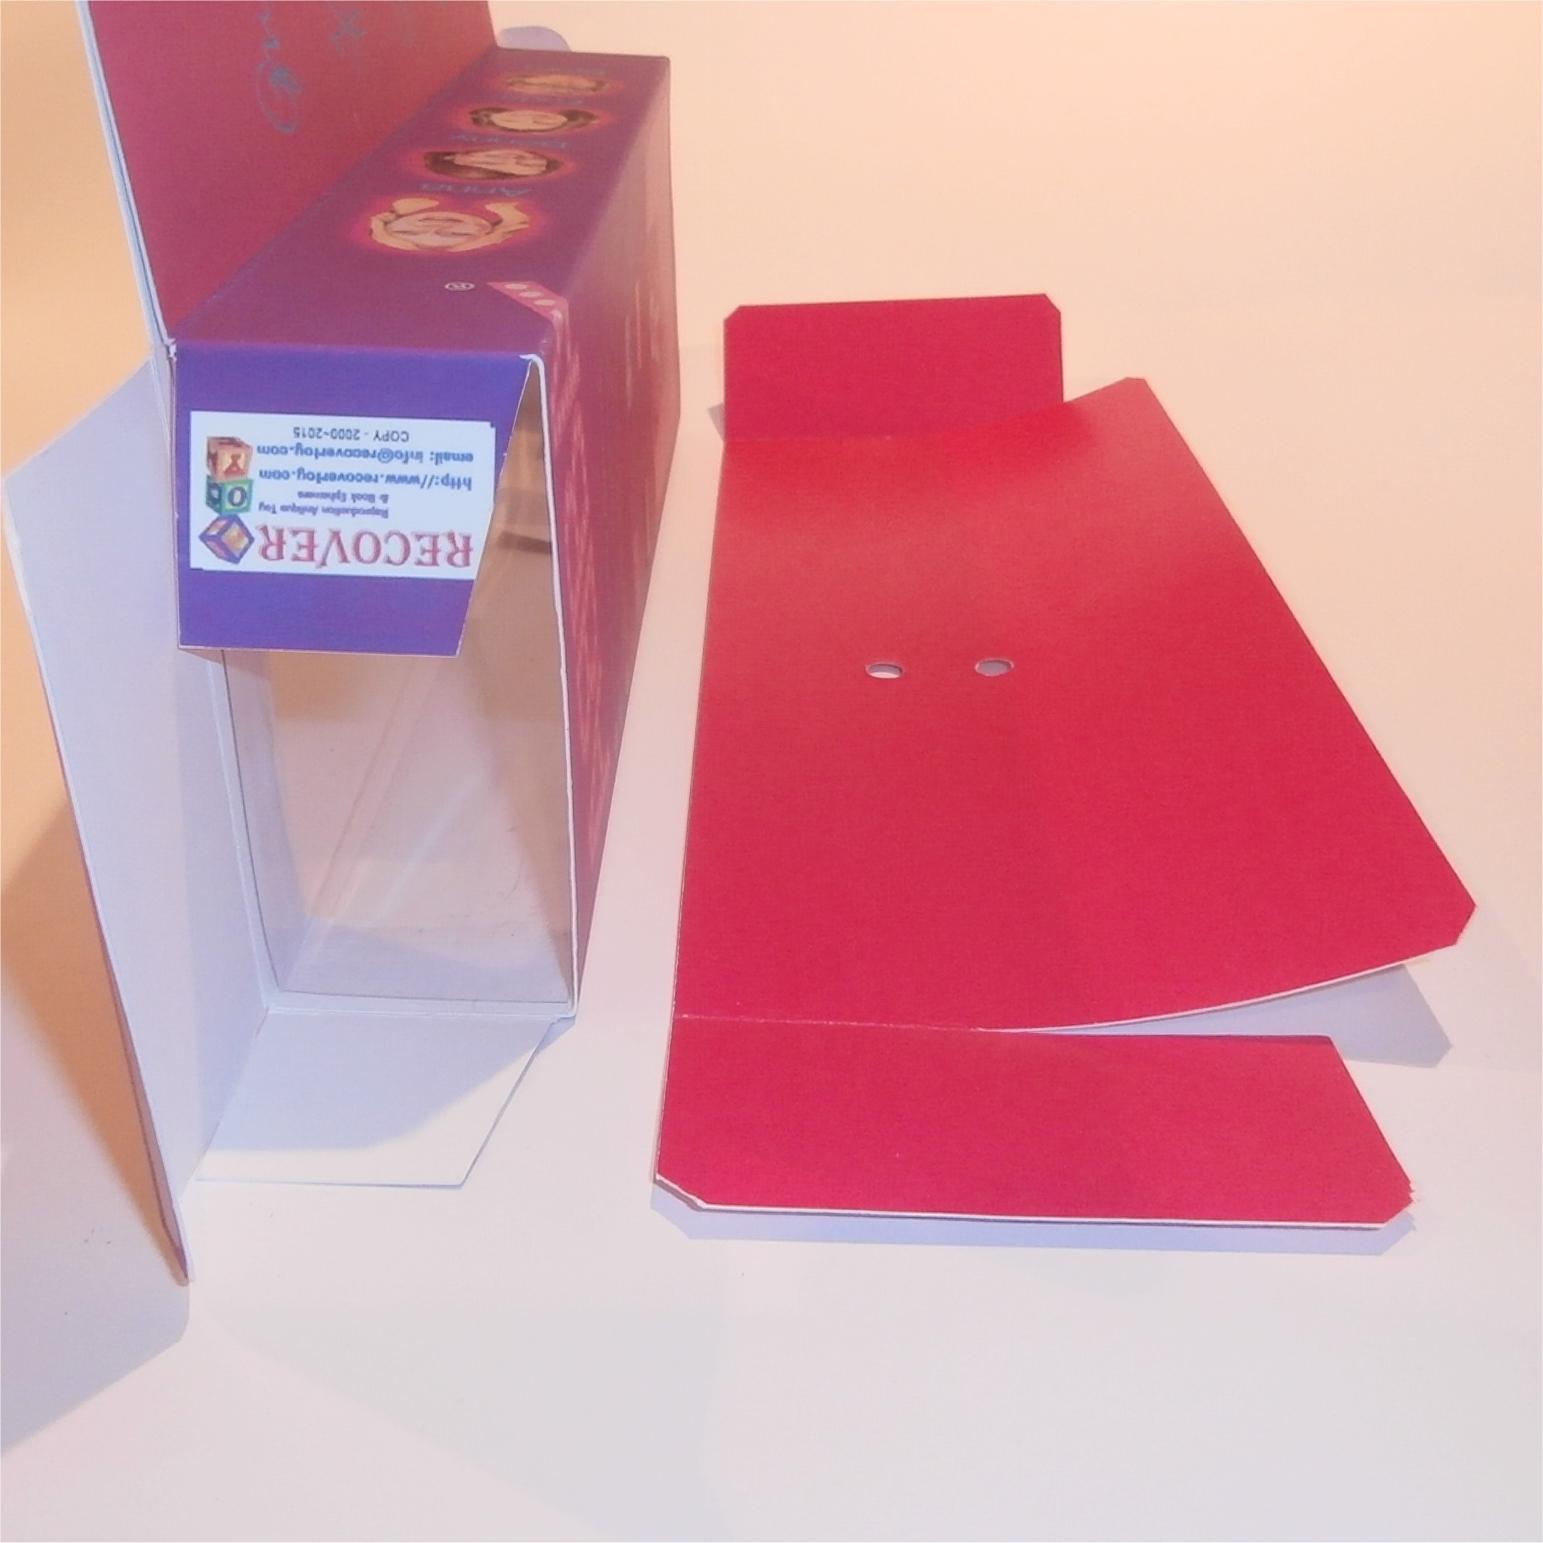 Matchbox Abba Doll Box Set of 4 - Inside